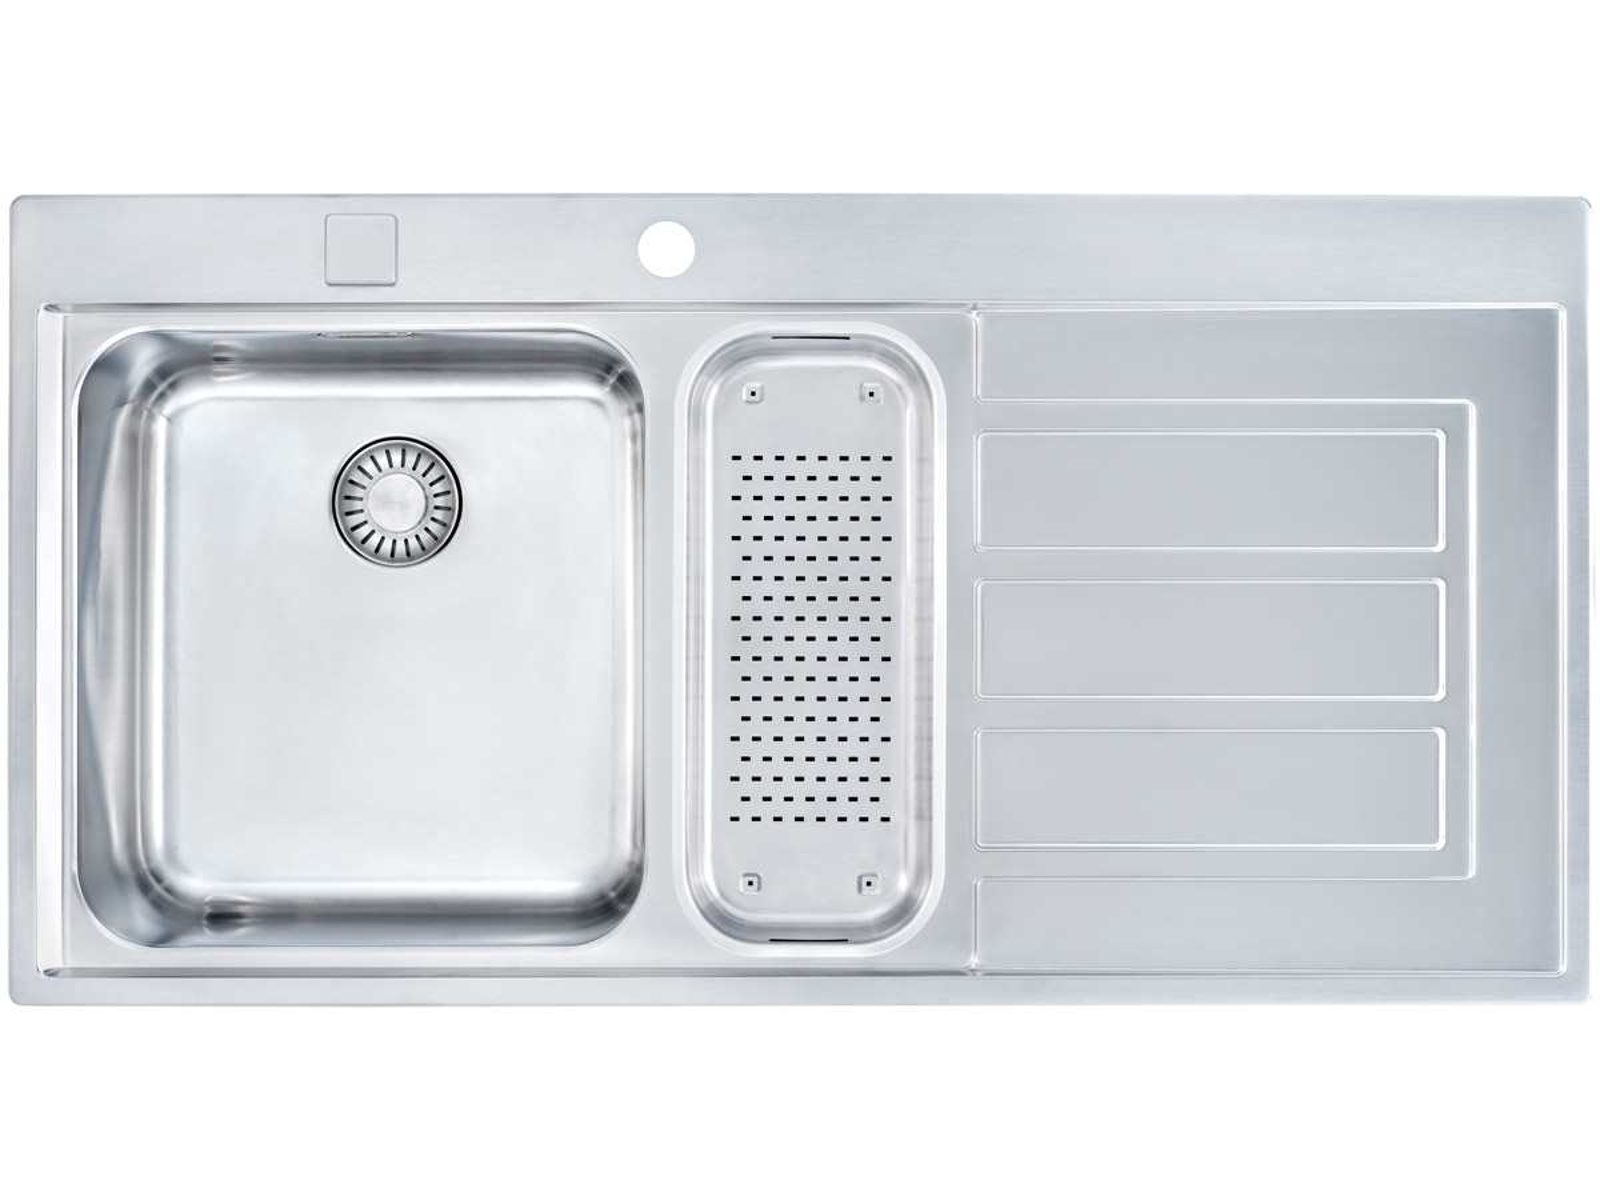 Hornbach Kuchenspule Franke Libera Lix 211 Abdeckung Ablauf Dusche